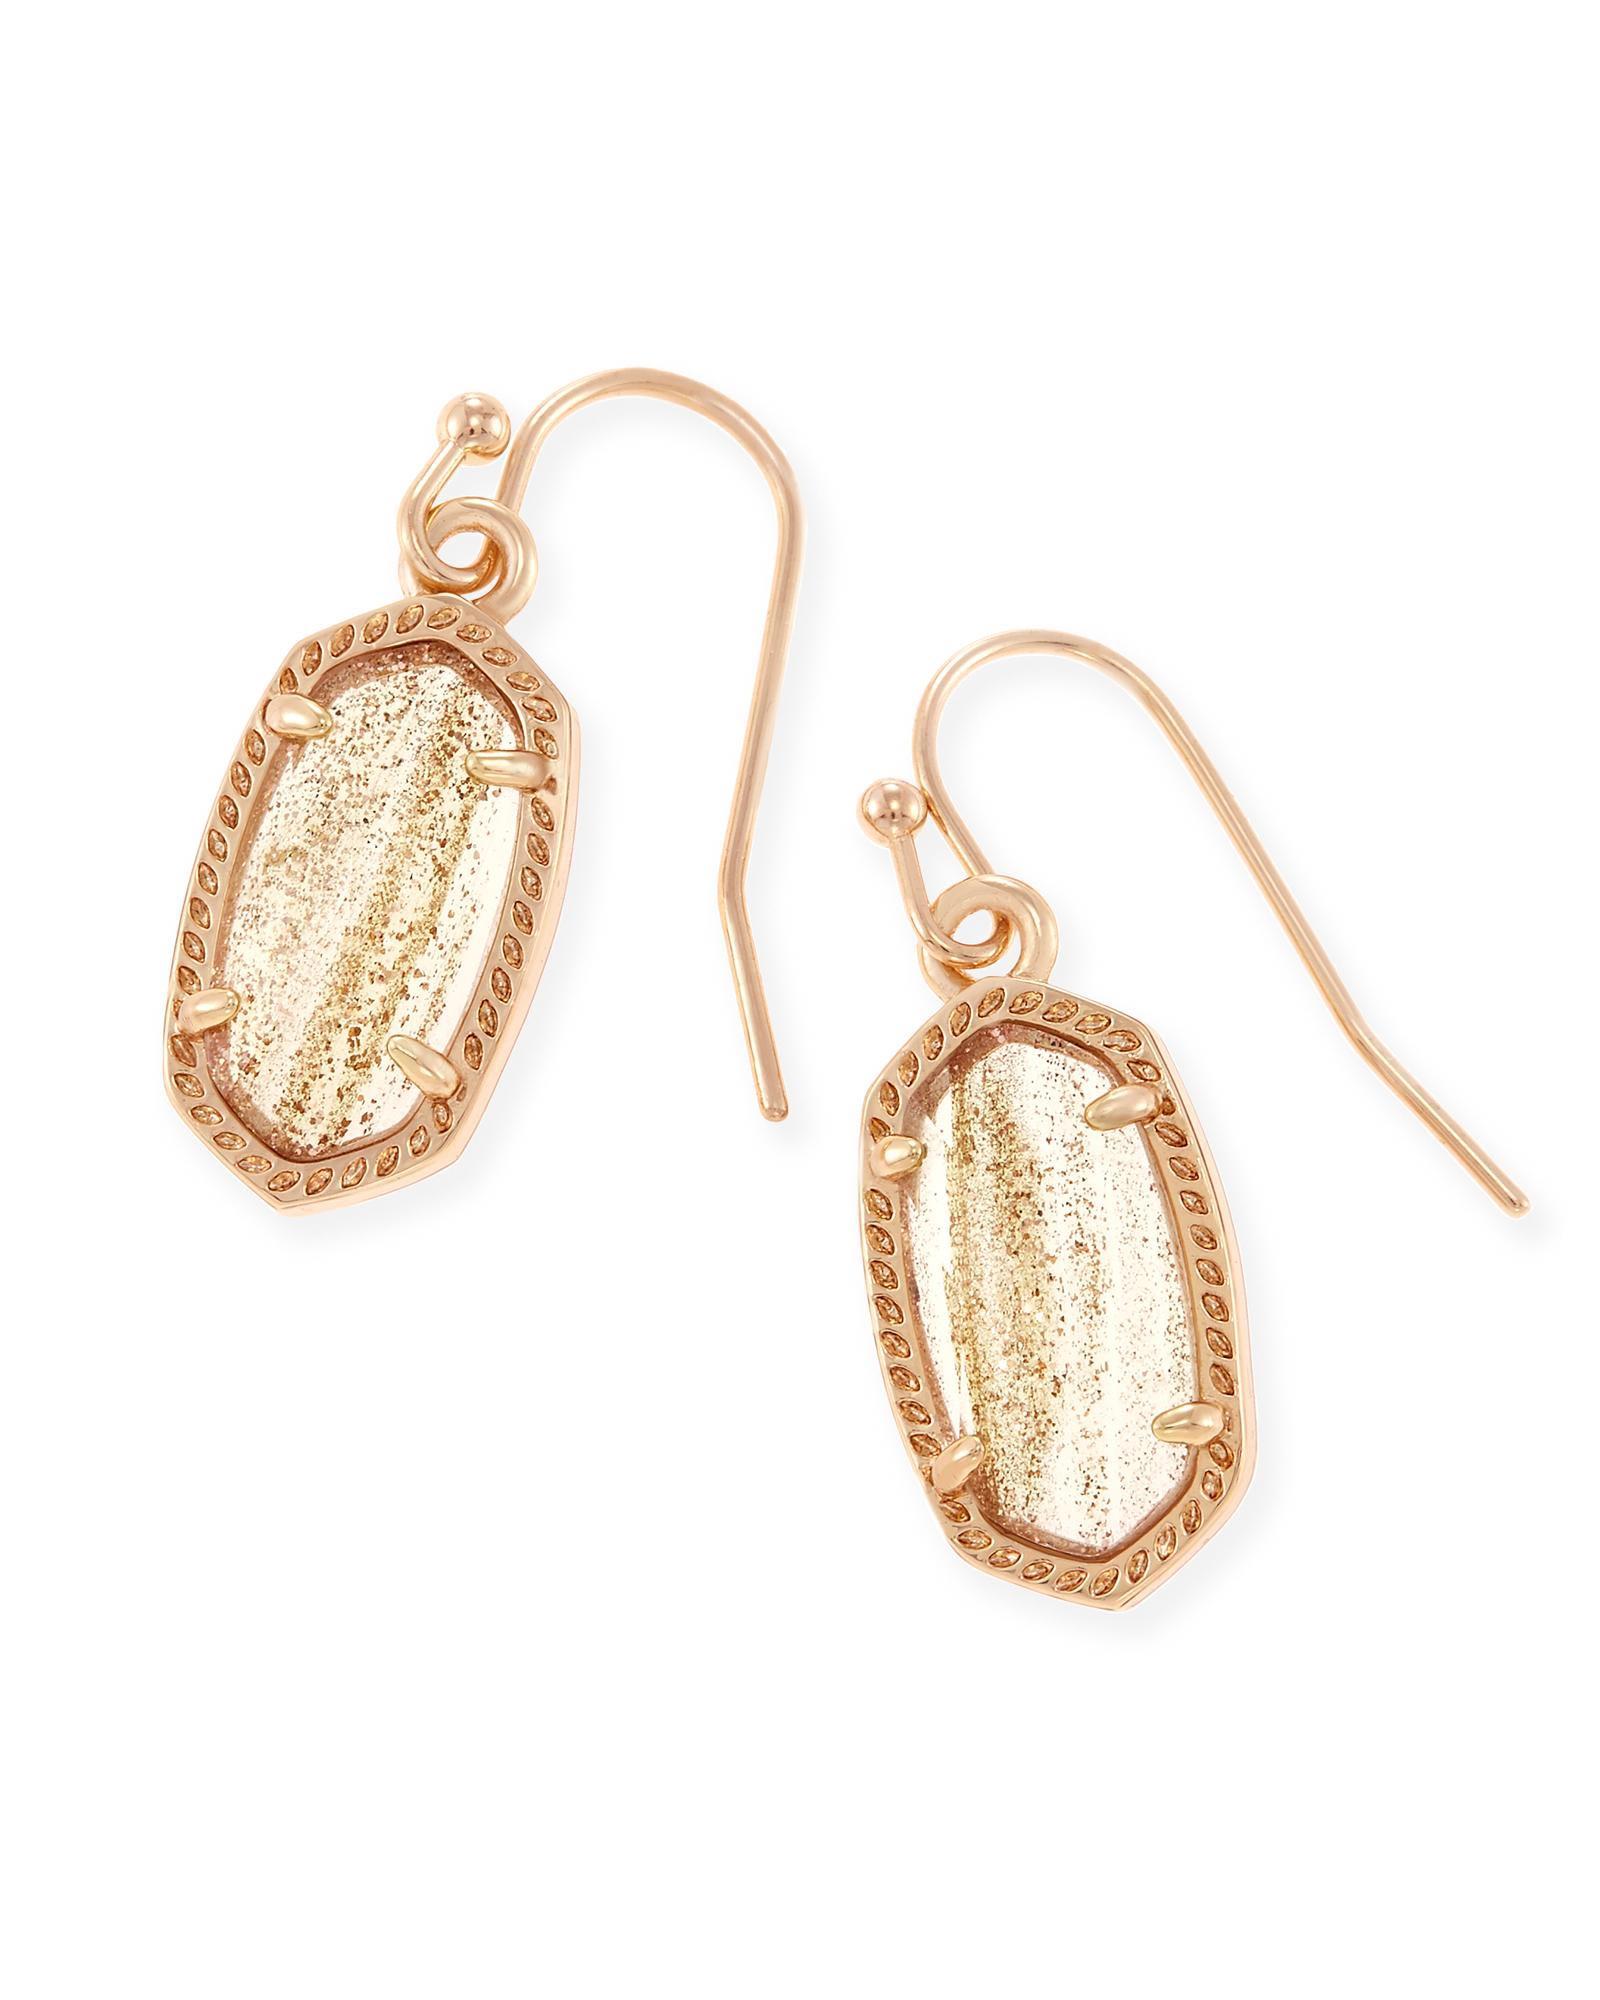 Kendra Scott Lee Earrings in 14k Rose Plated Brass ztIysDSQO1